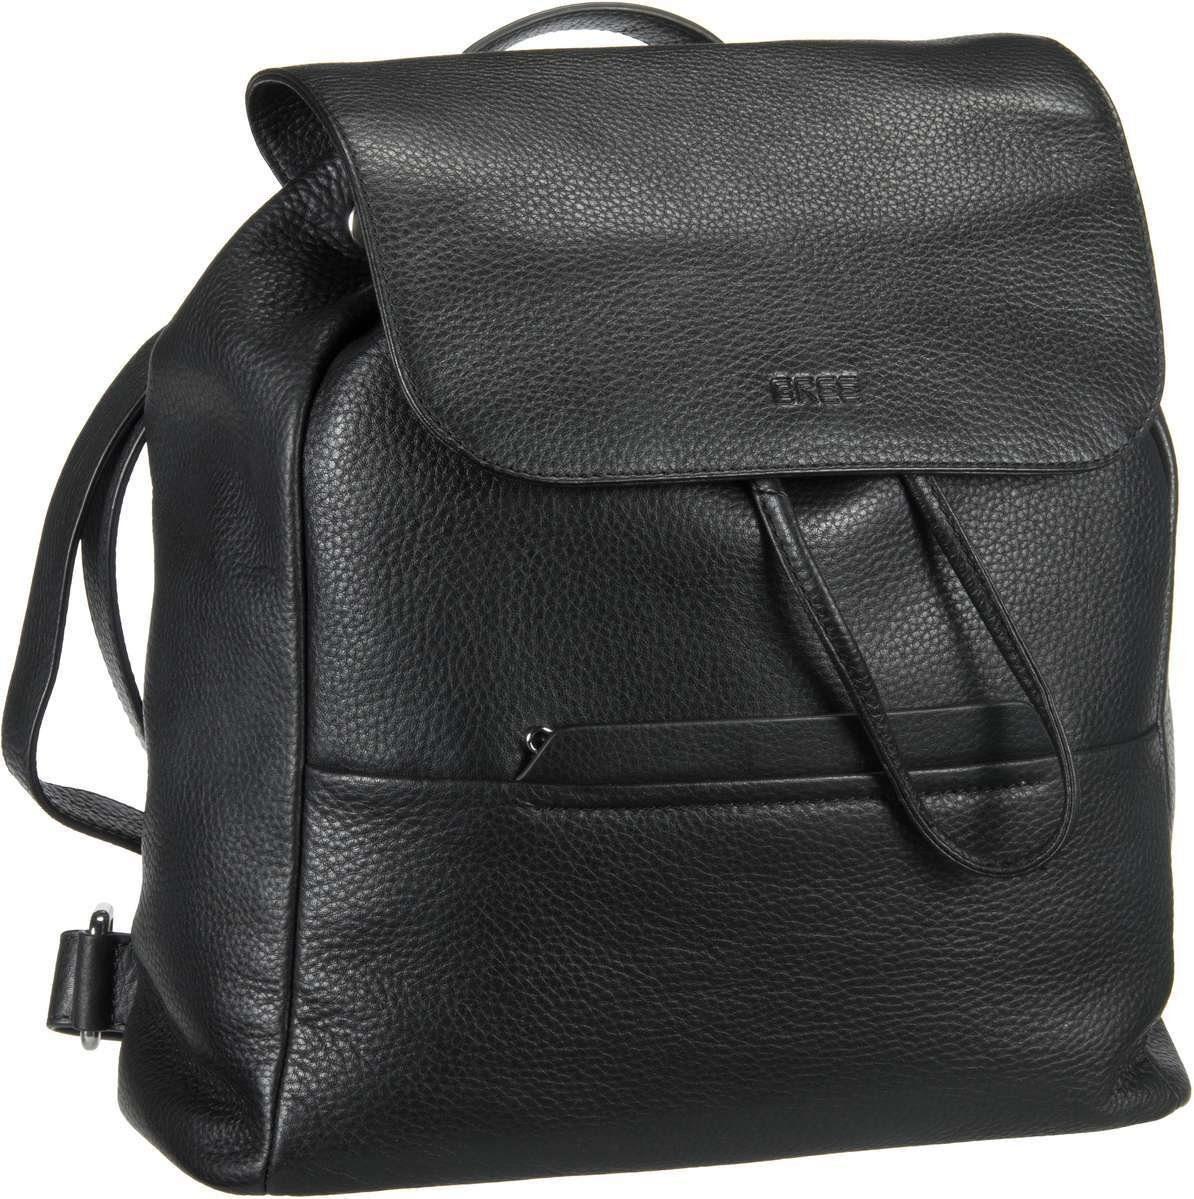 bree rucksack